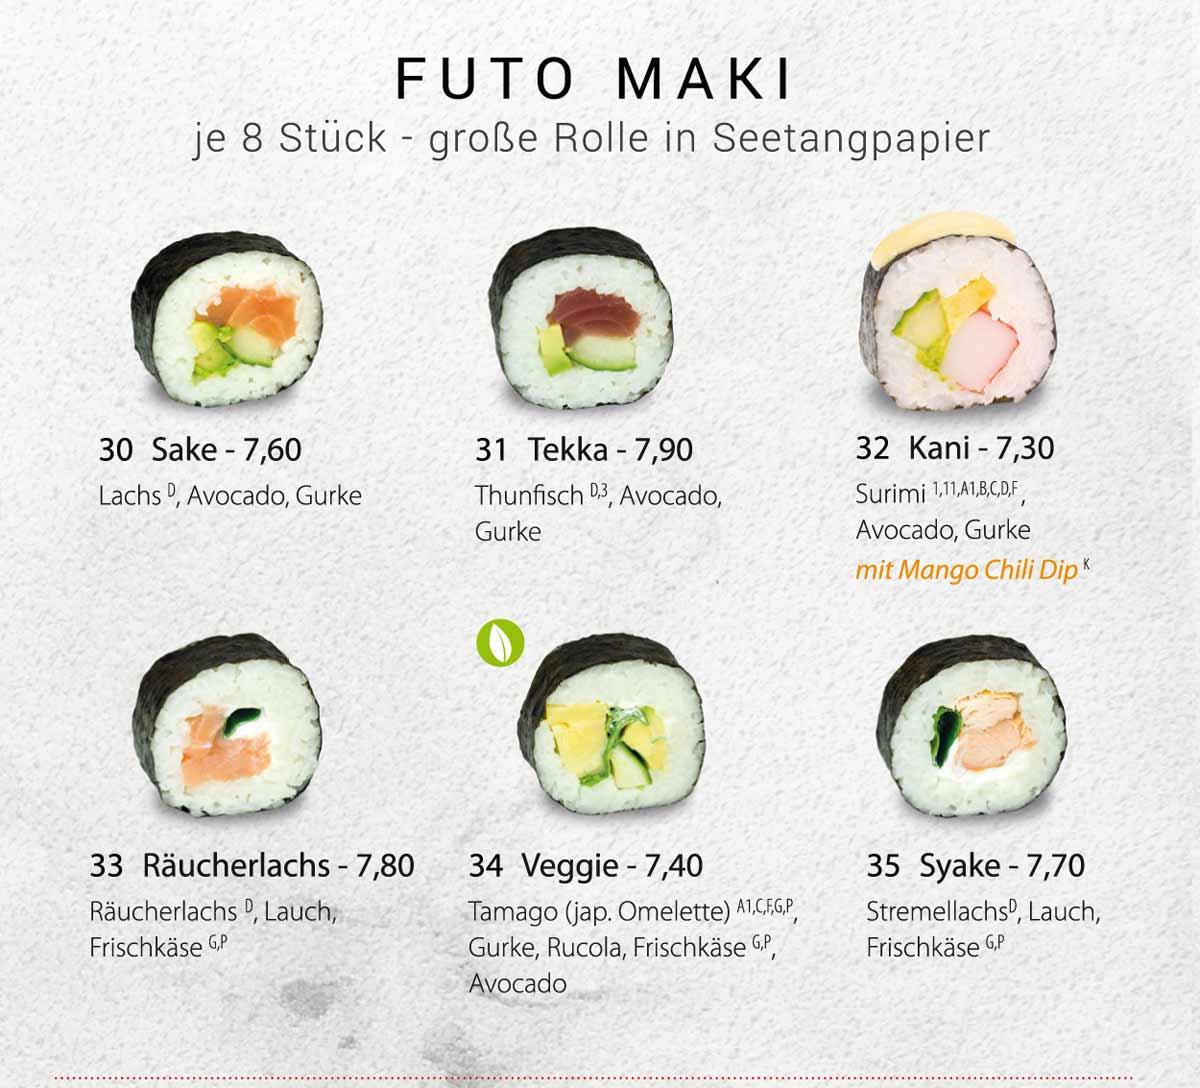 Sushifreunde | Speisekarte | Futo Maki - Große Rolle in Seetangpapier